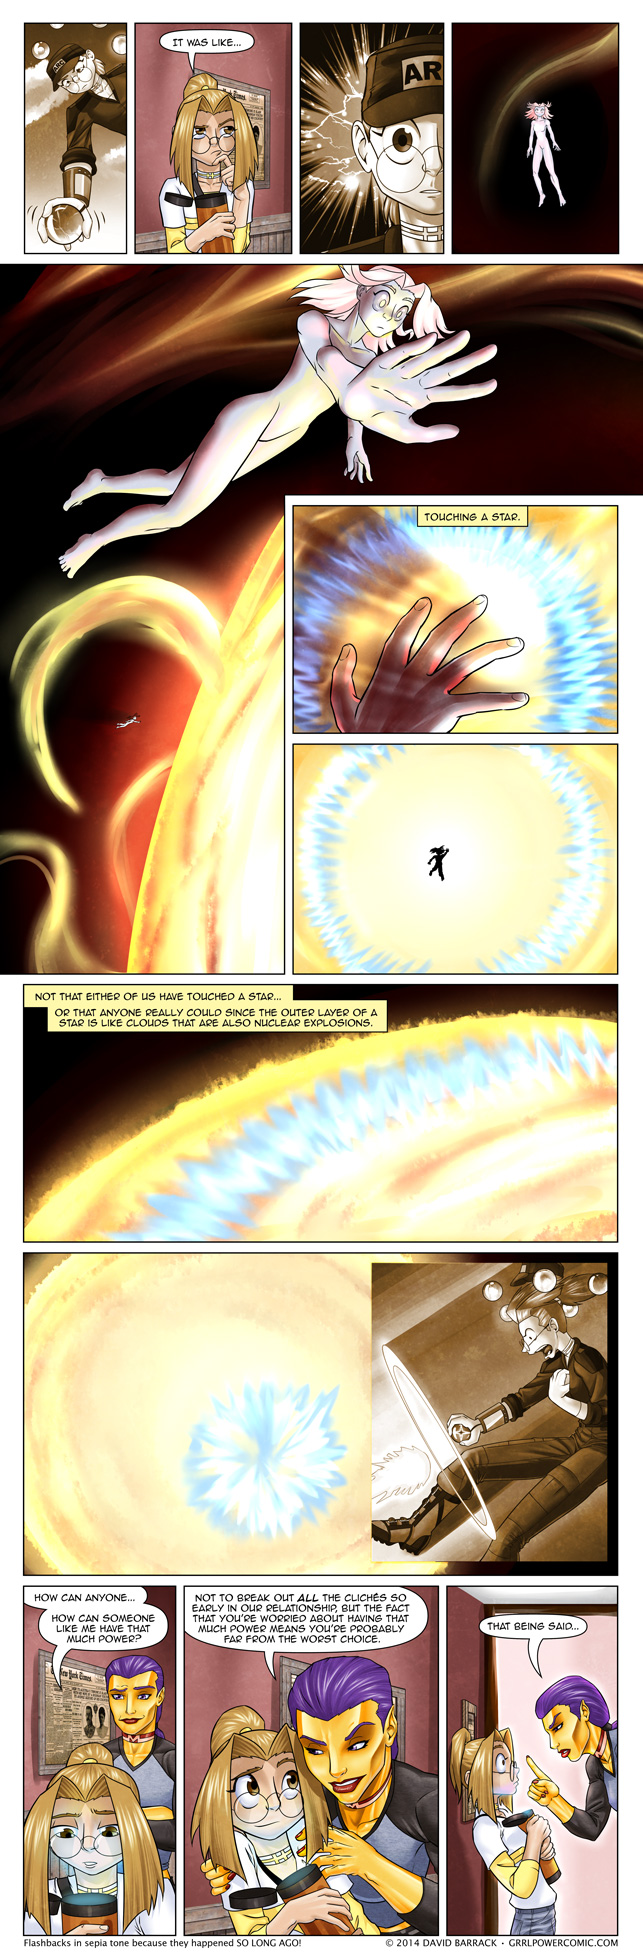 Grrl Power #192 – Touching star